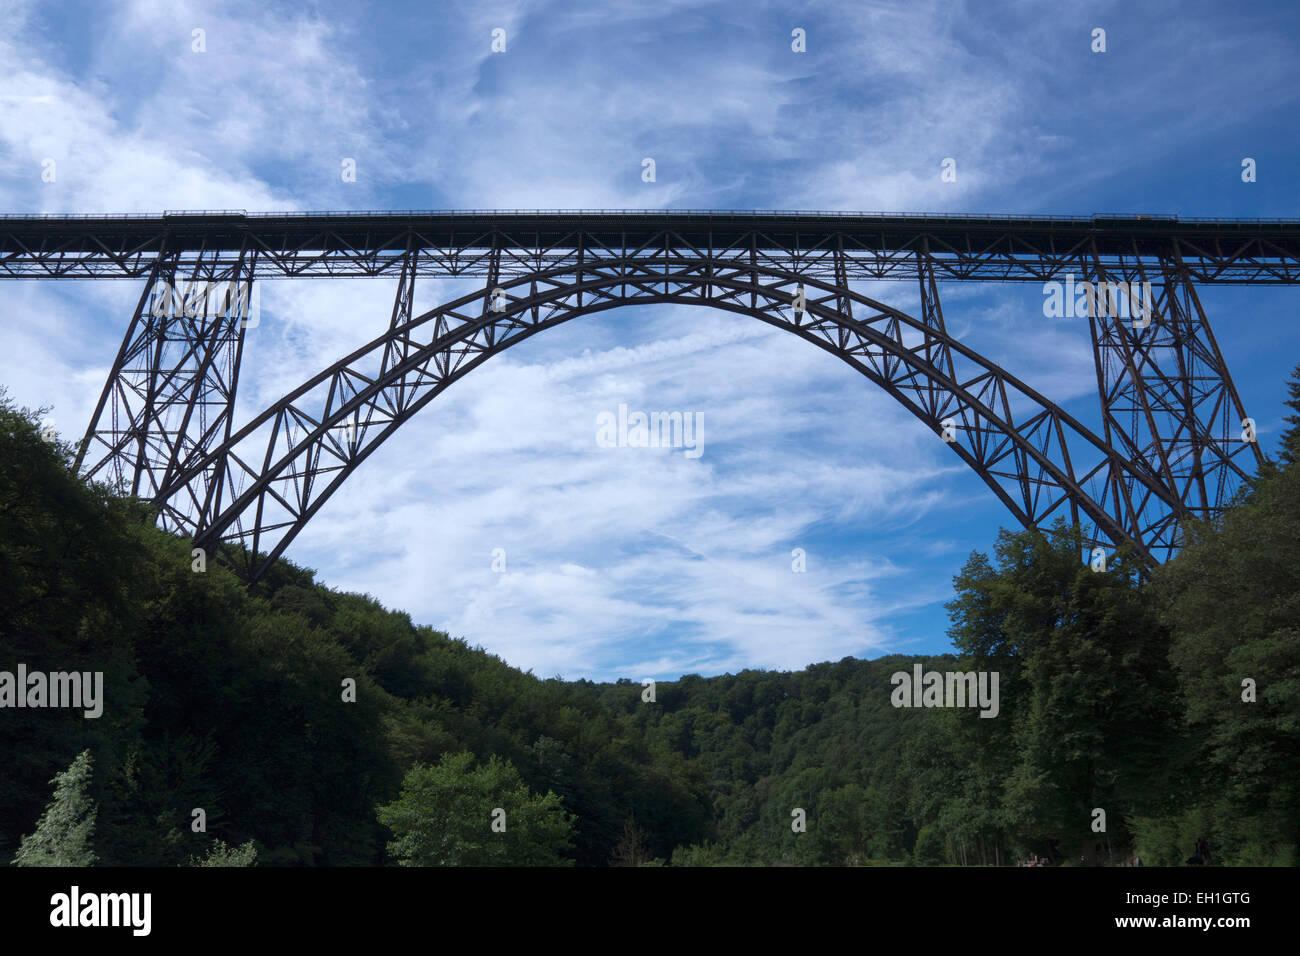 müngsten bridge, north rhine-westphalia, germany, europe - Stock Image